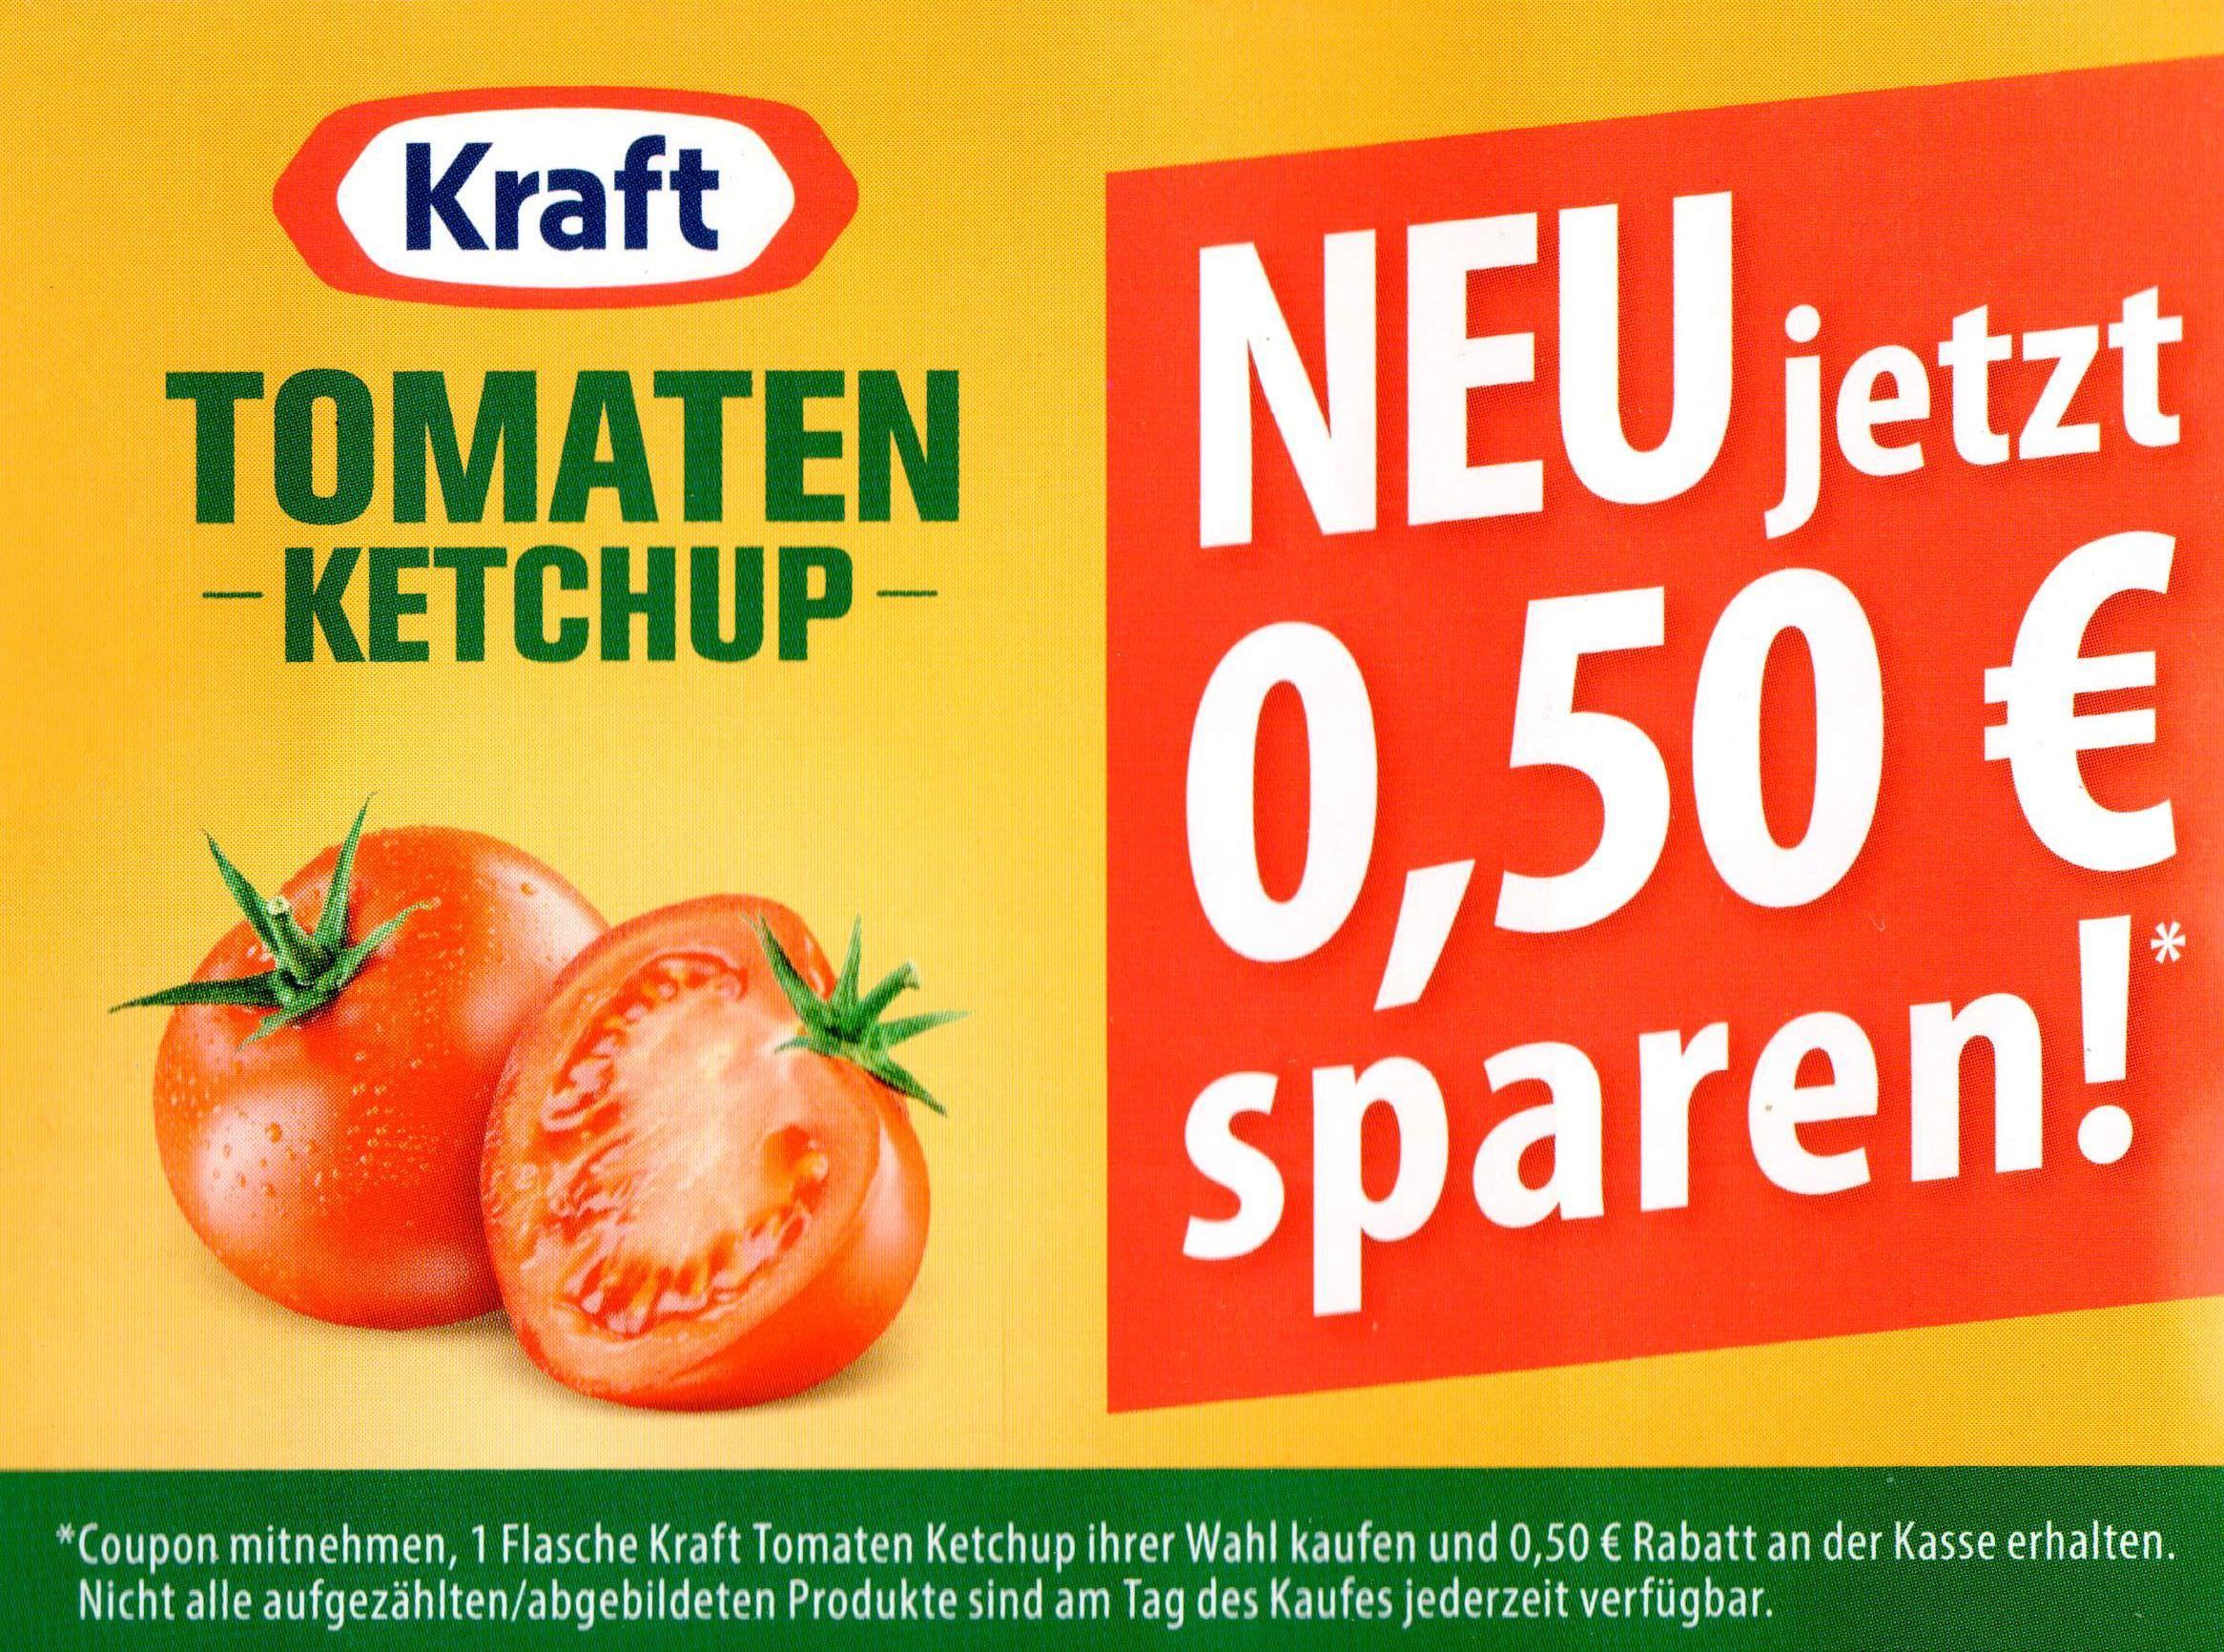 Kraft Tomaten Ketchup (alle Größen/Sorten) -0,50€ Coupon bis 30.06.2018 [bundesweit]